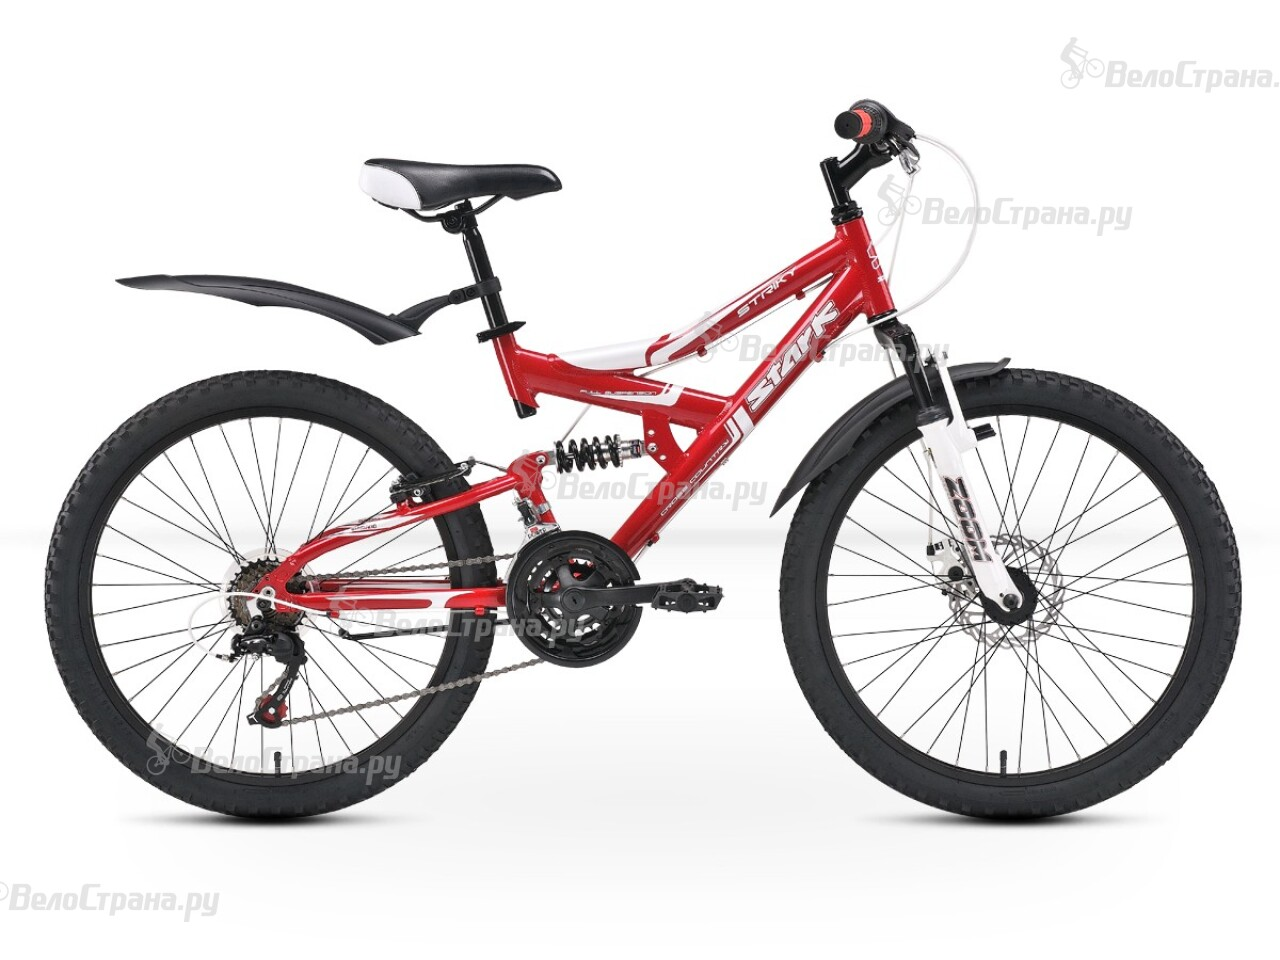 Велосипед Stark Striky FS Disc (2013) велосипед challenger mission lux fs 26 черно красный 16